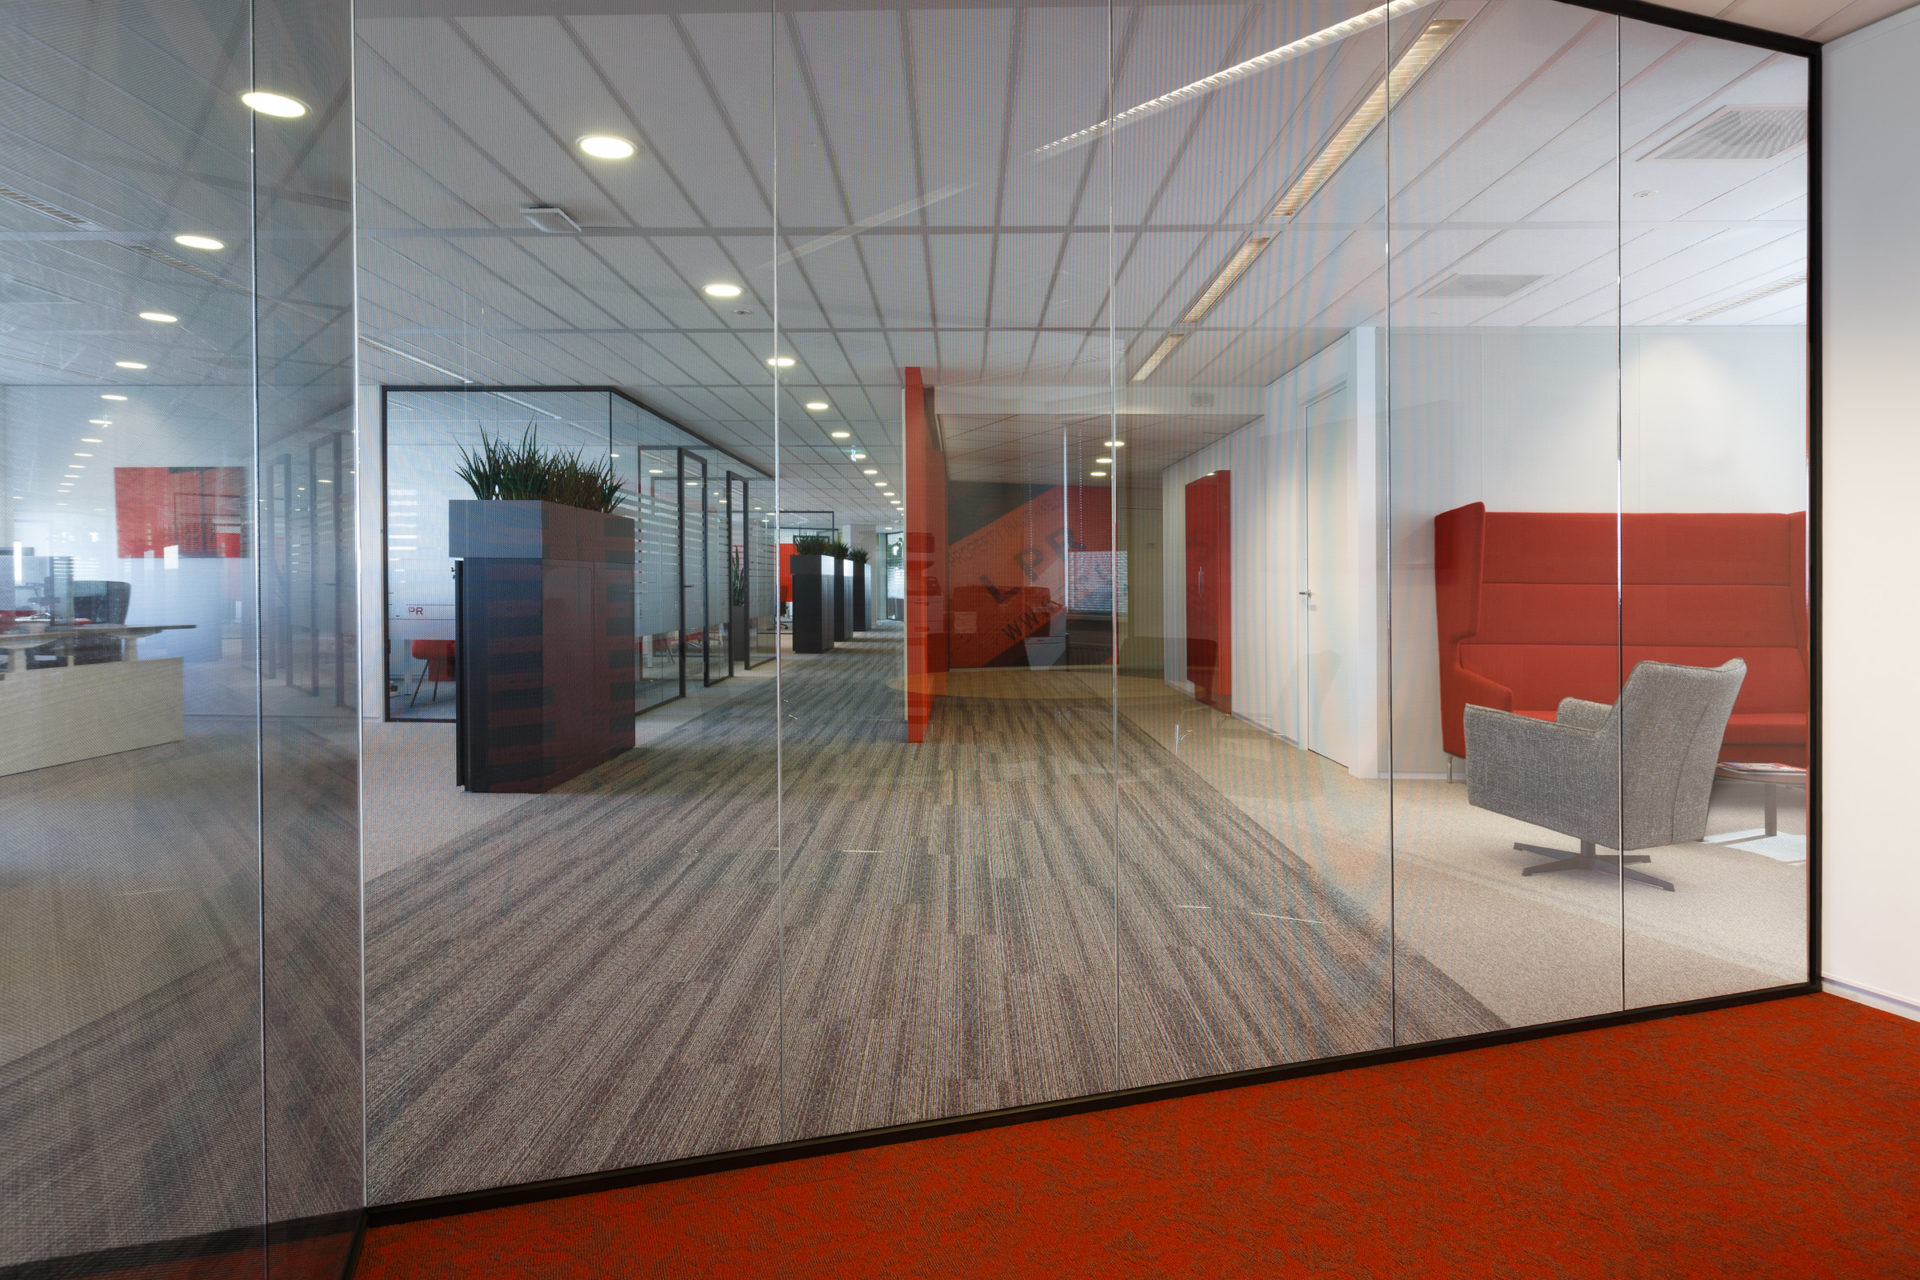 LPR Benelux - project Topper interieur ontwerp en projecten